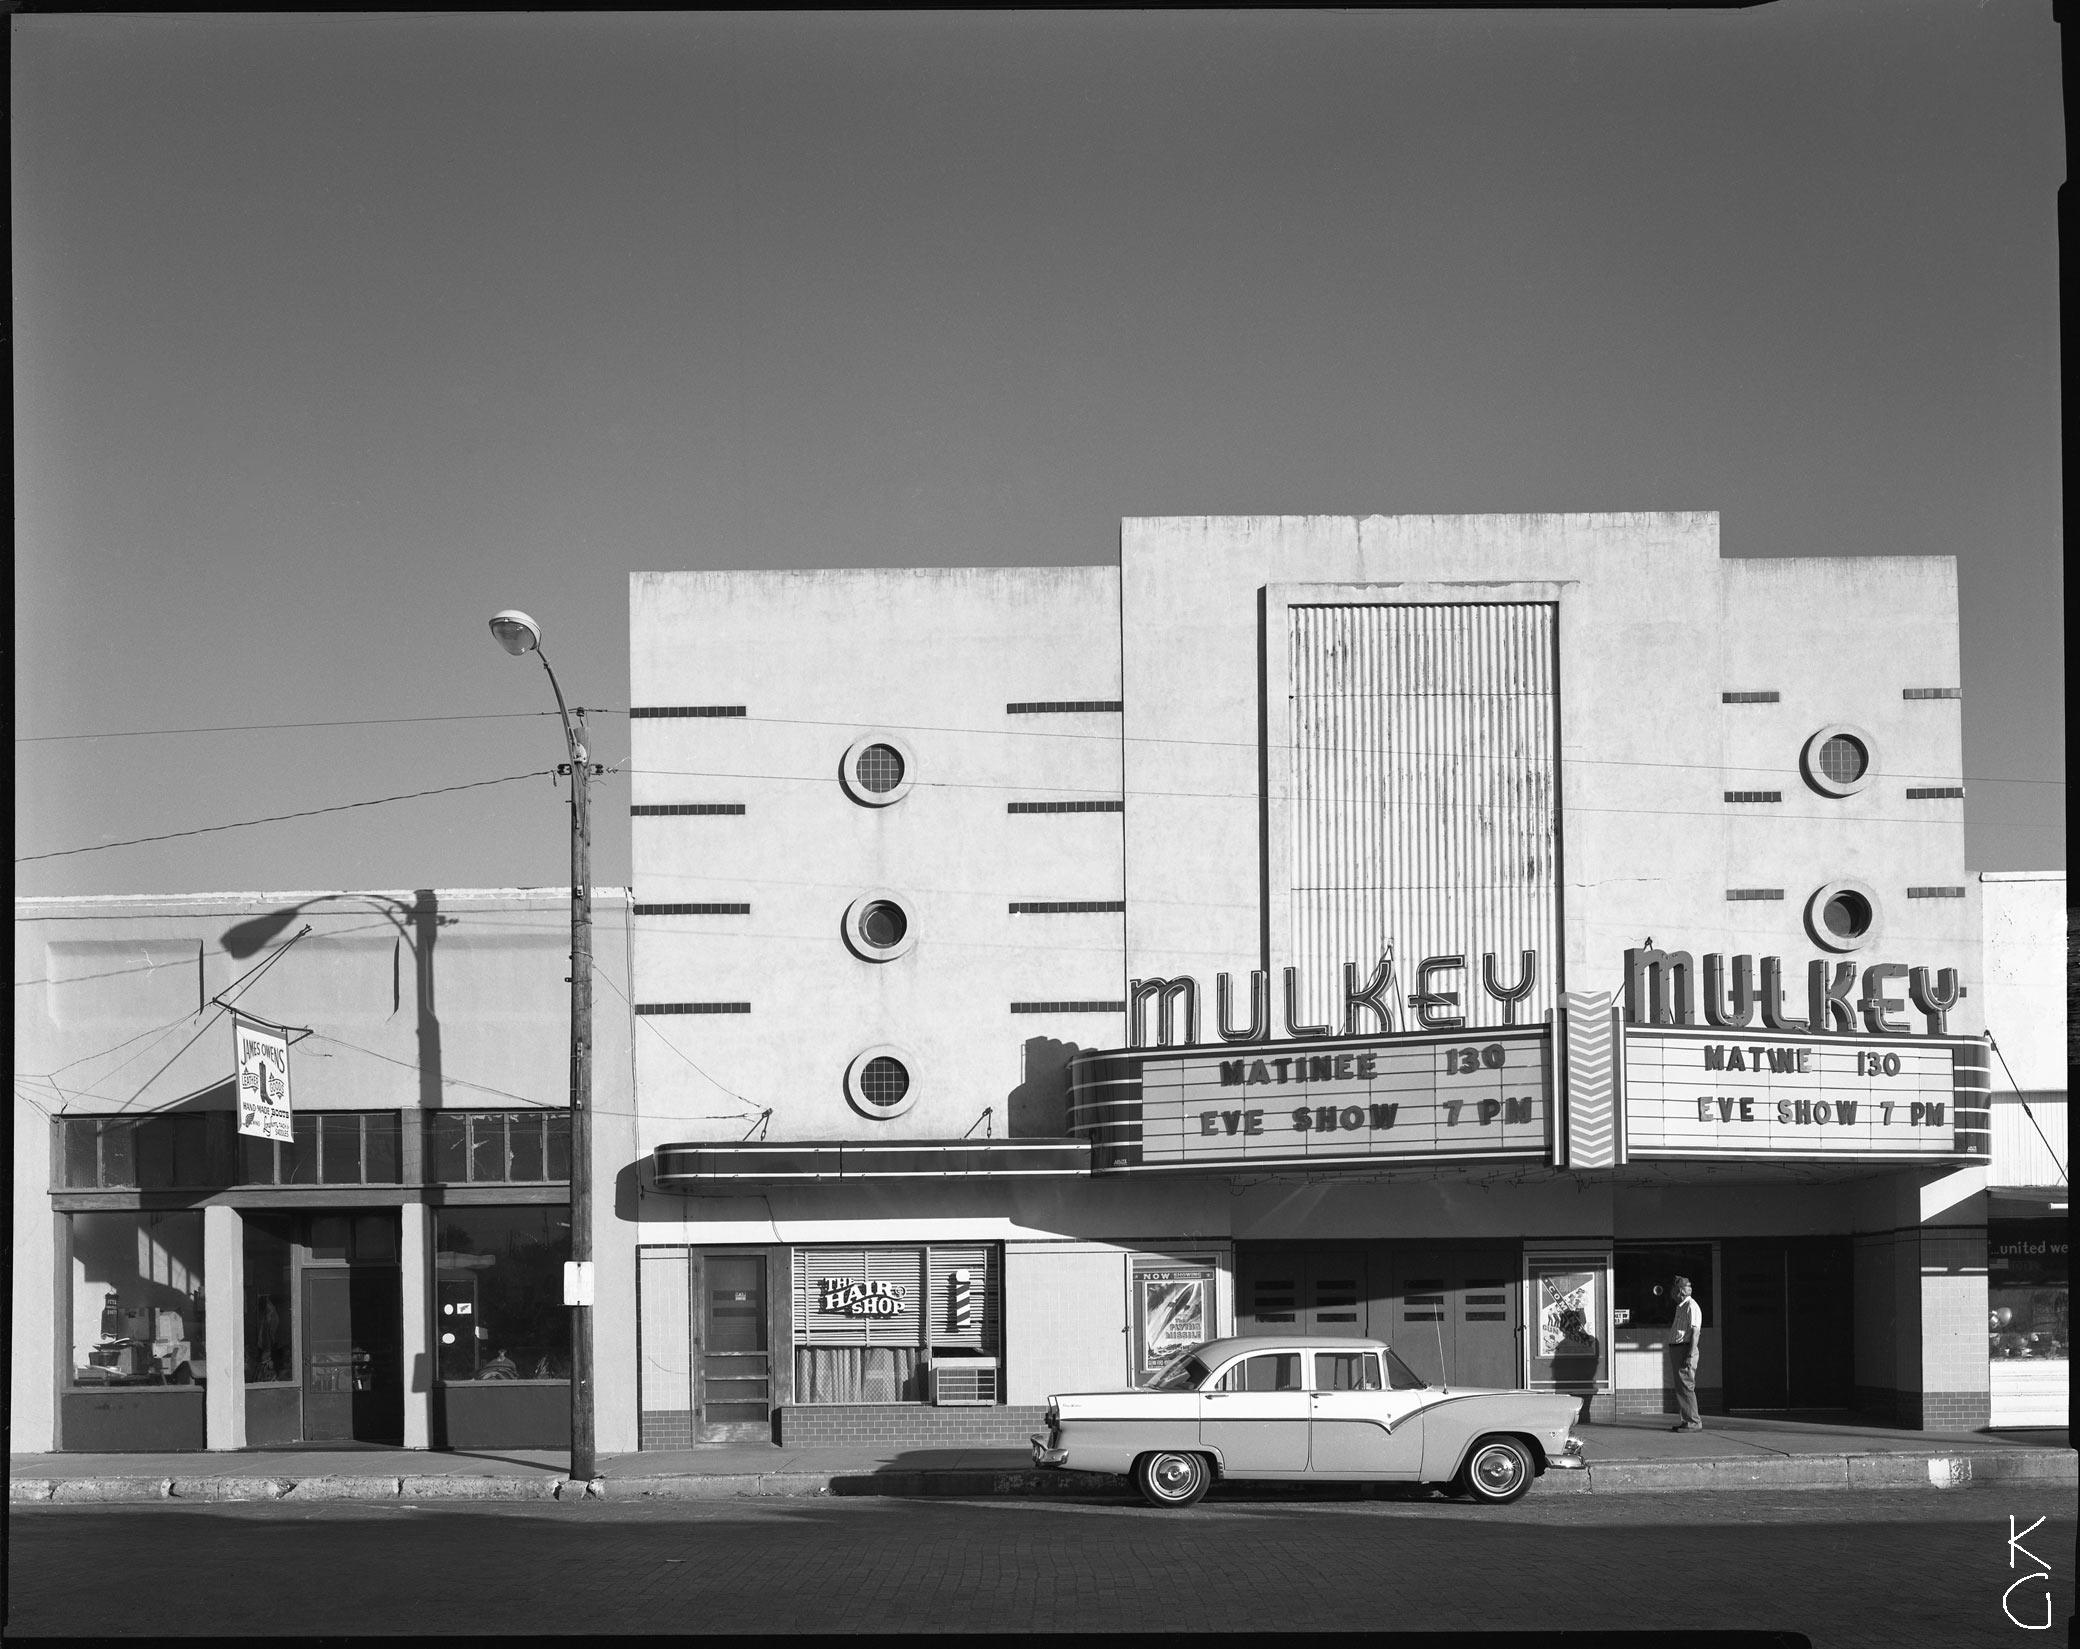 Mulkey Cinema, The Panhandle 1987